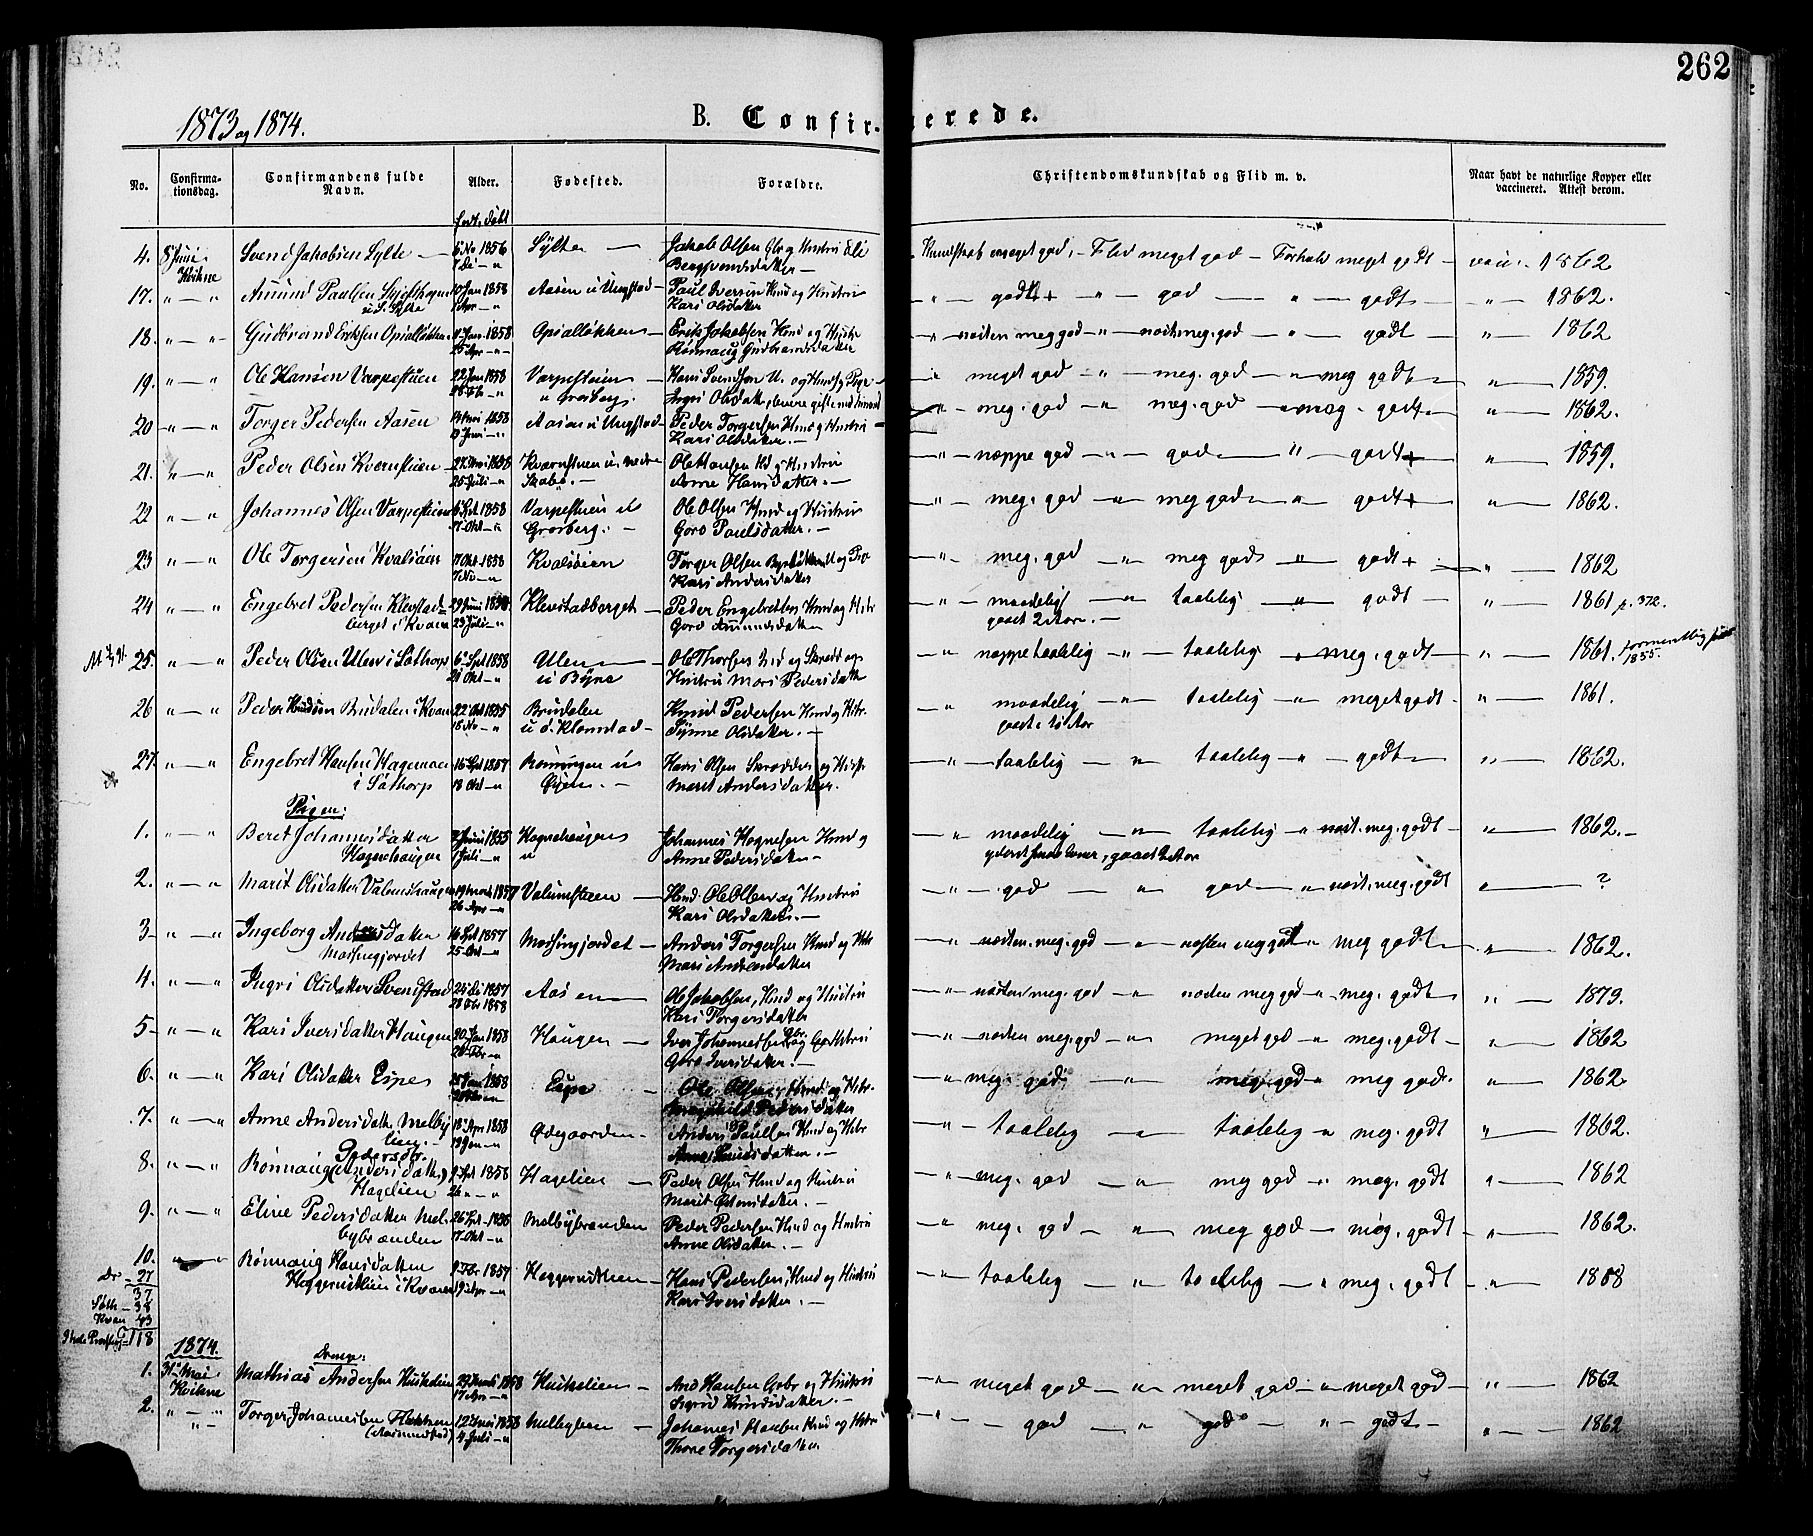 SAH, Nord-Fron prestekontor, Ministerialbok nr. 2, 1865-1883, s. 262